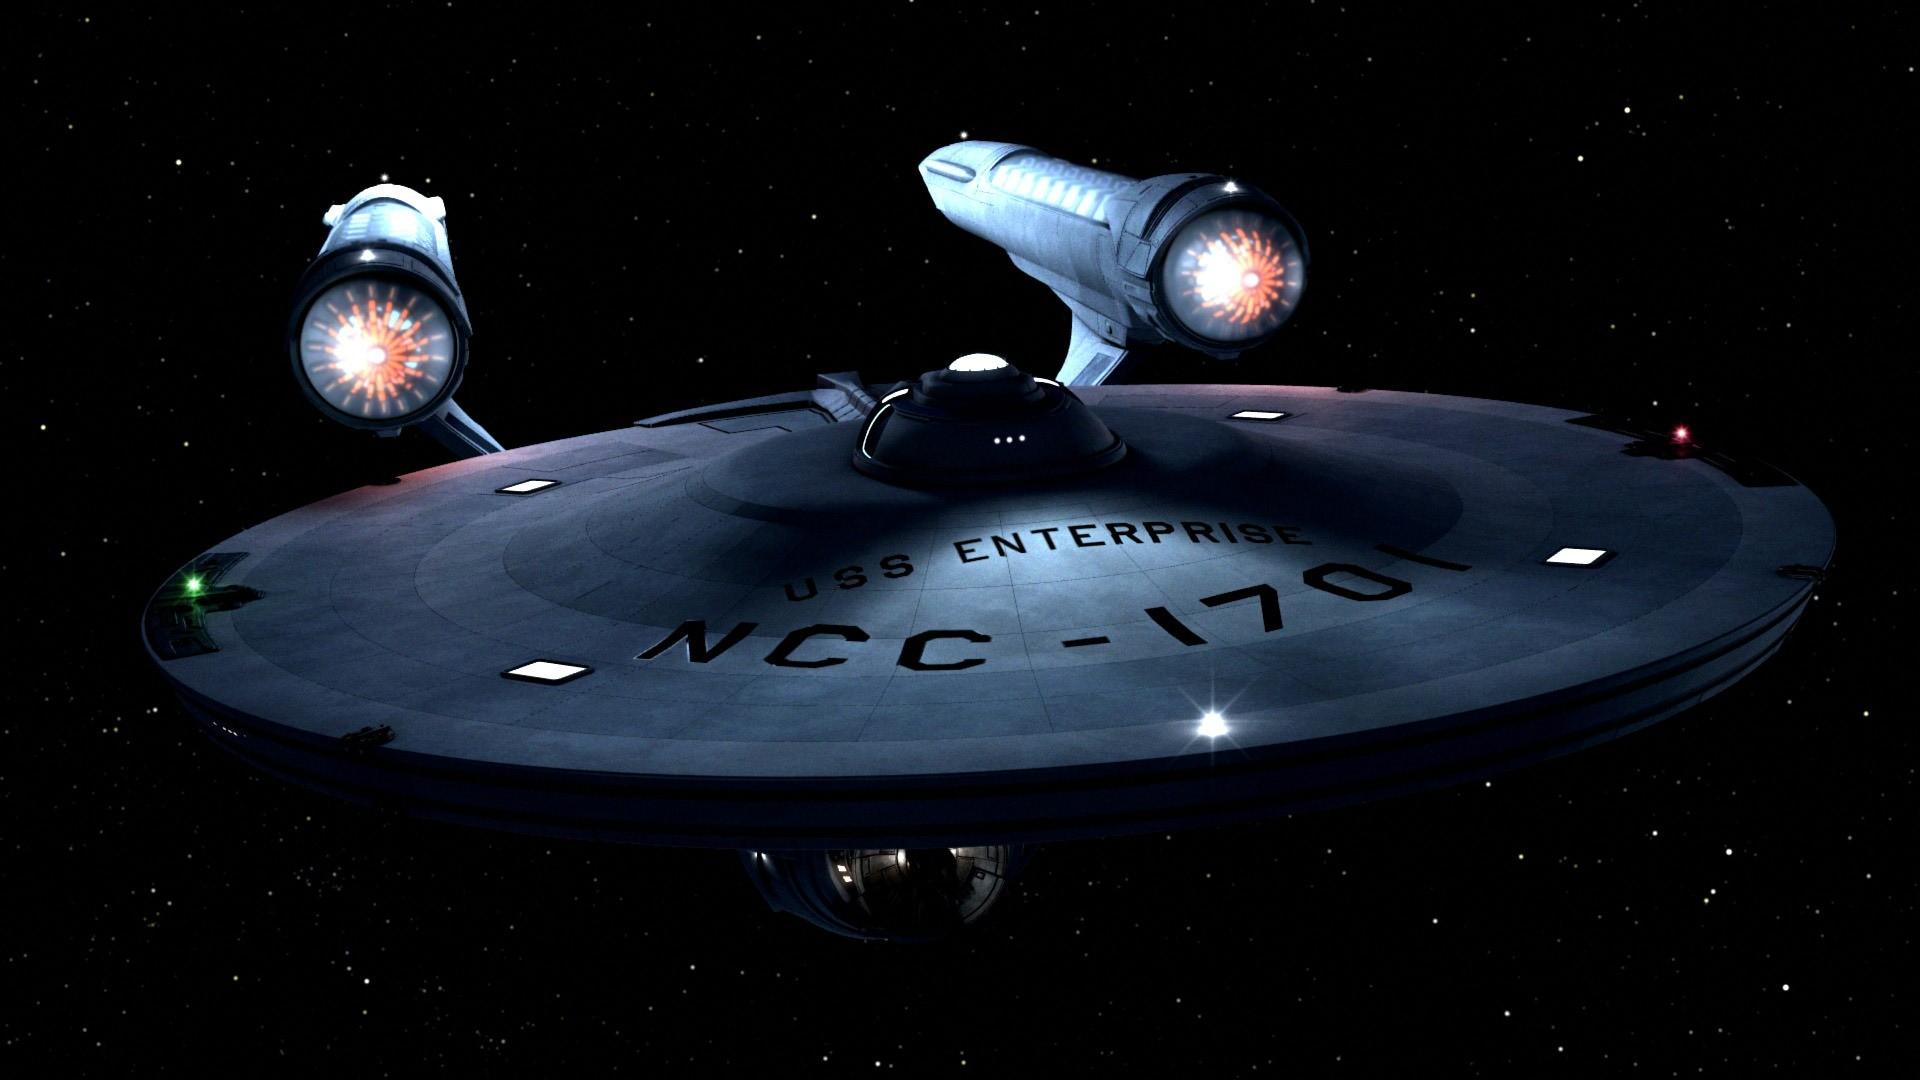 Star Trek Daily Pic – Daily Pic # 1691, TOS Enterprise